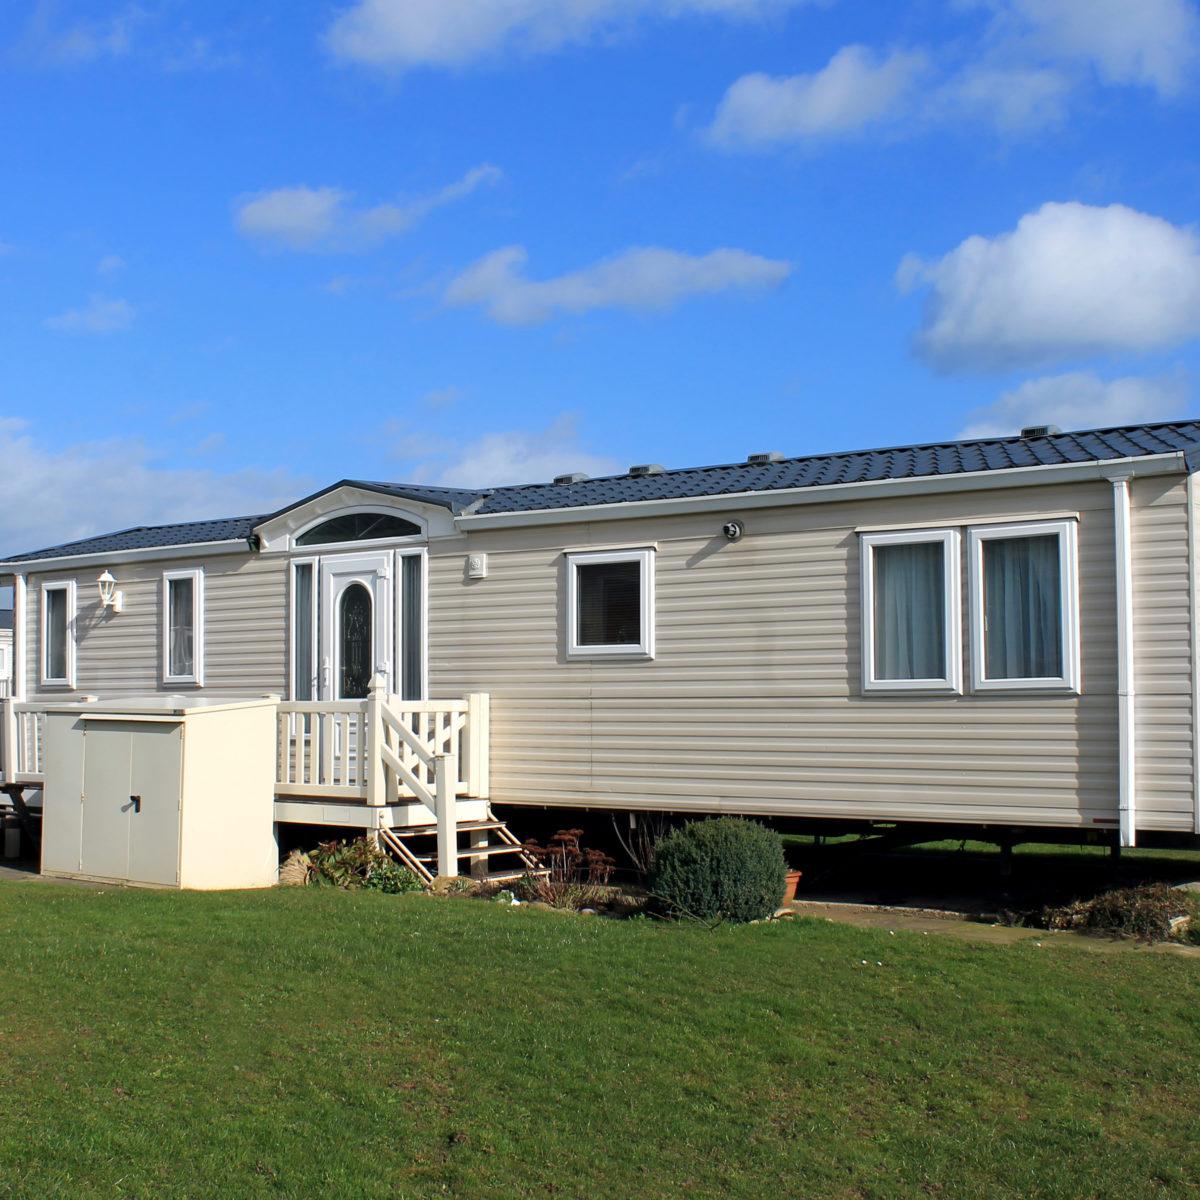 Cream caravan in trailer park